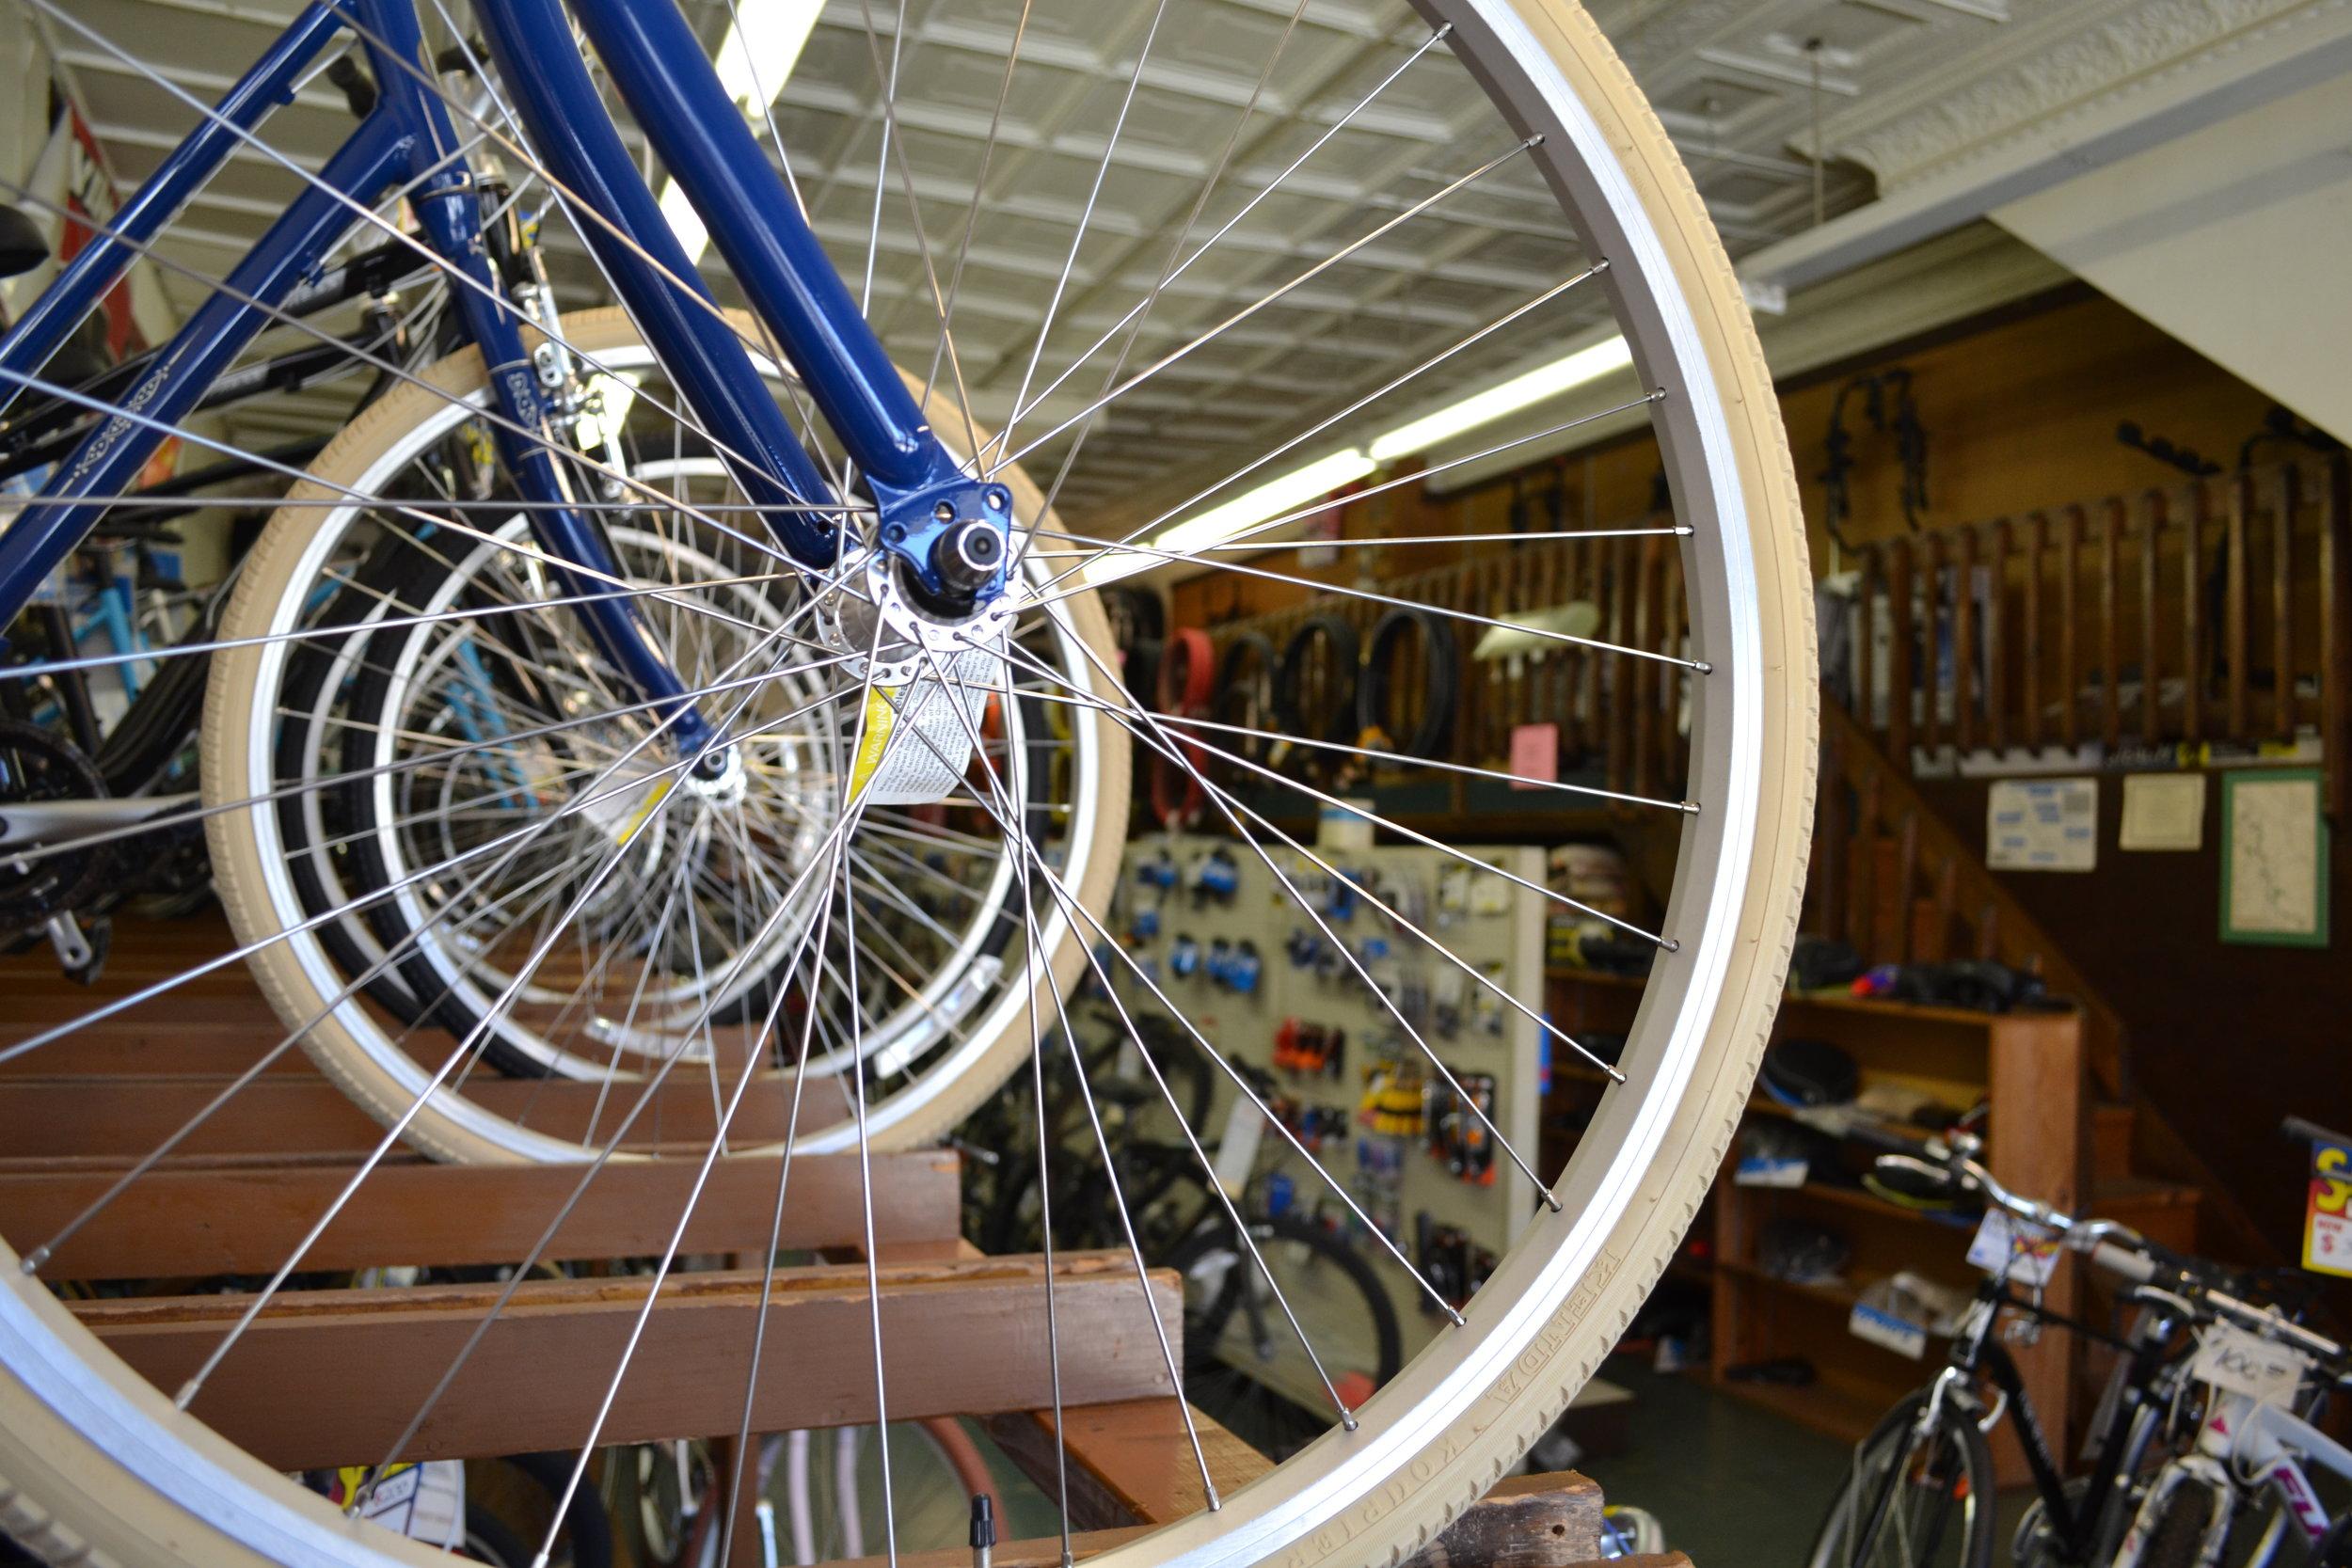 Coraopolis Bicycle Shop - 1000 4th Ave, (412) 299-0877